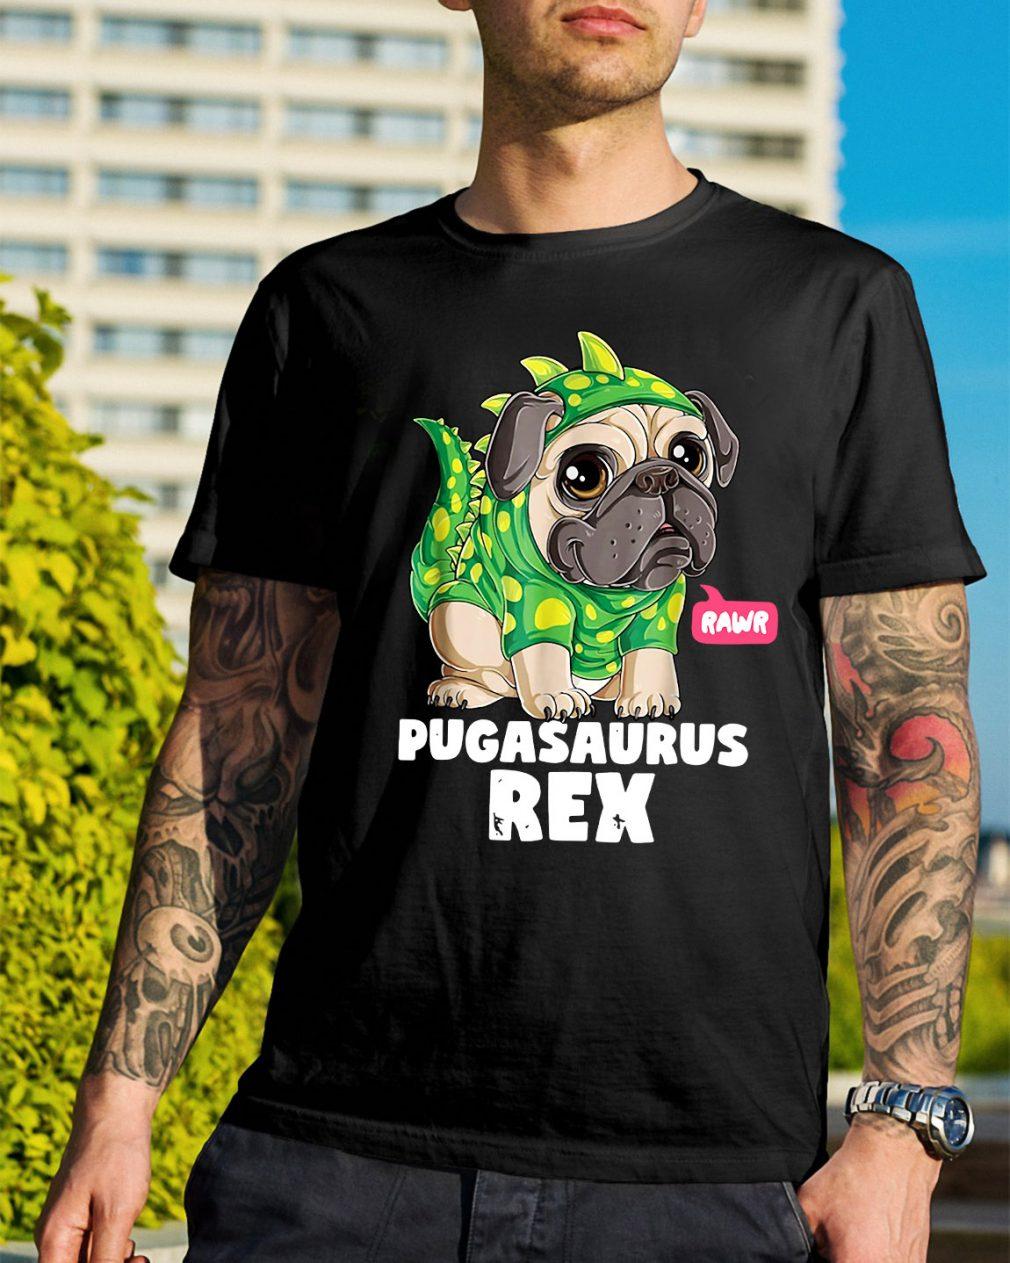 Rawr Pugasaurus Rex shirt